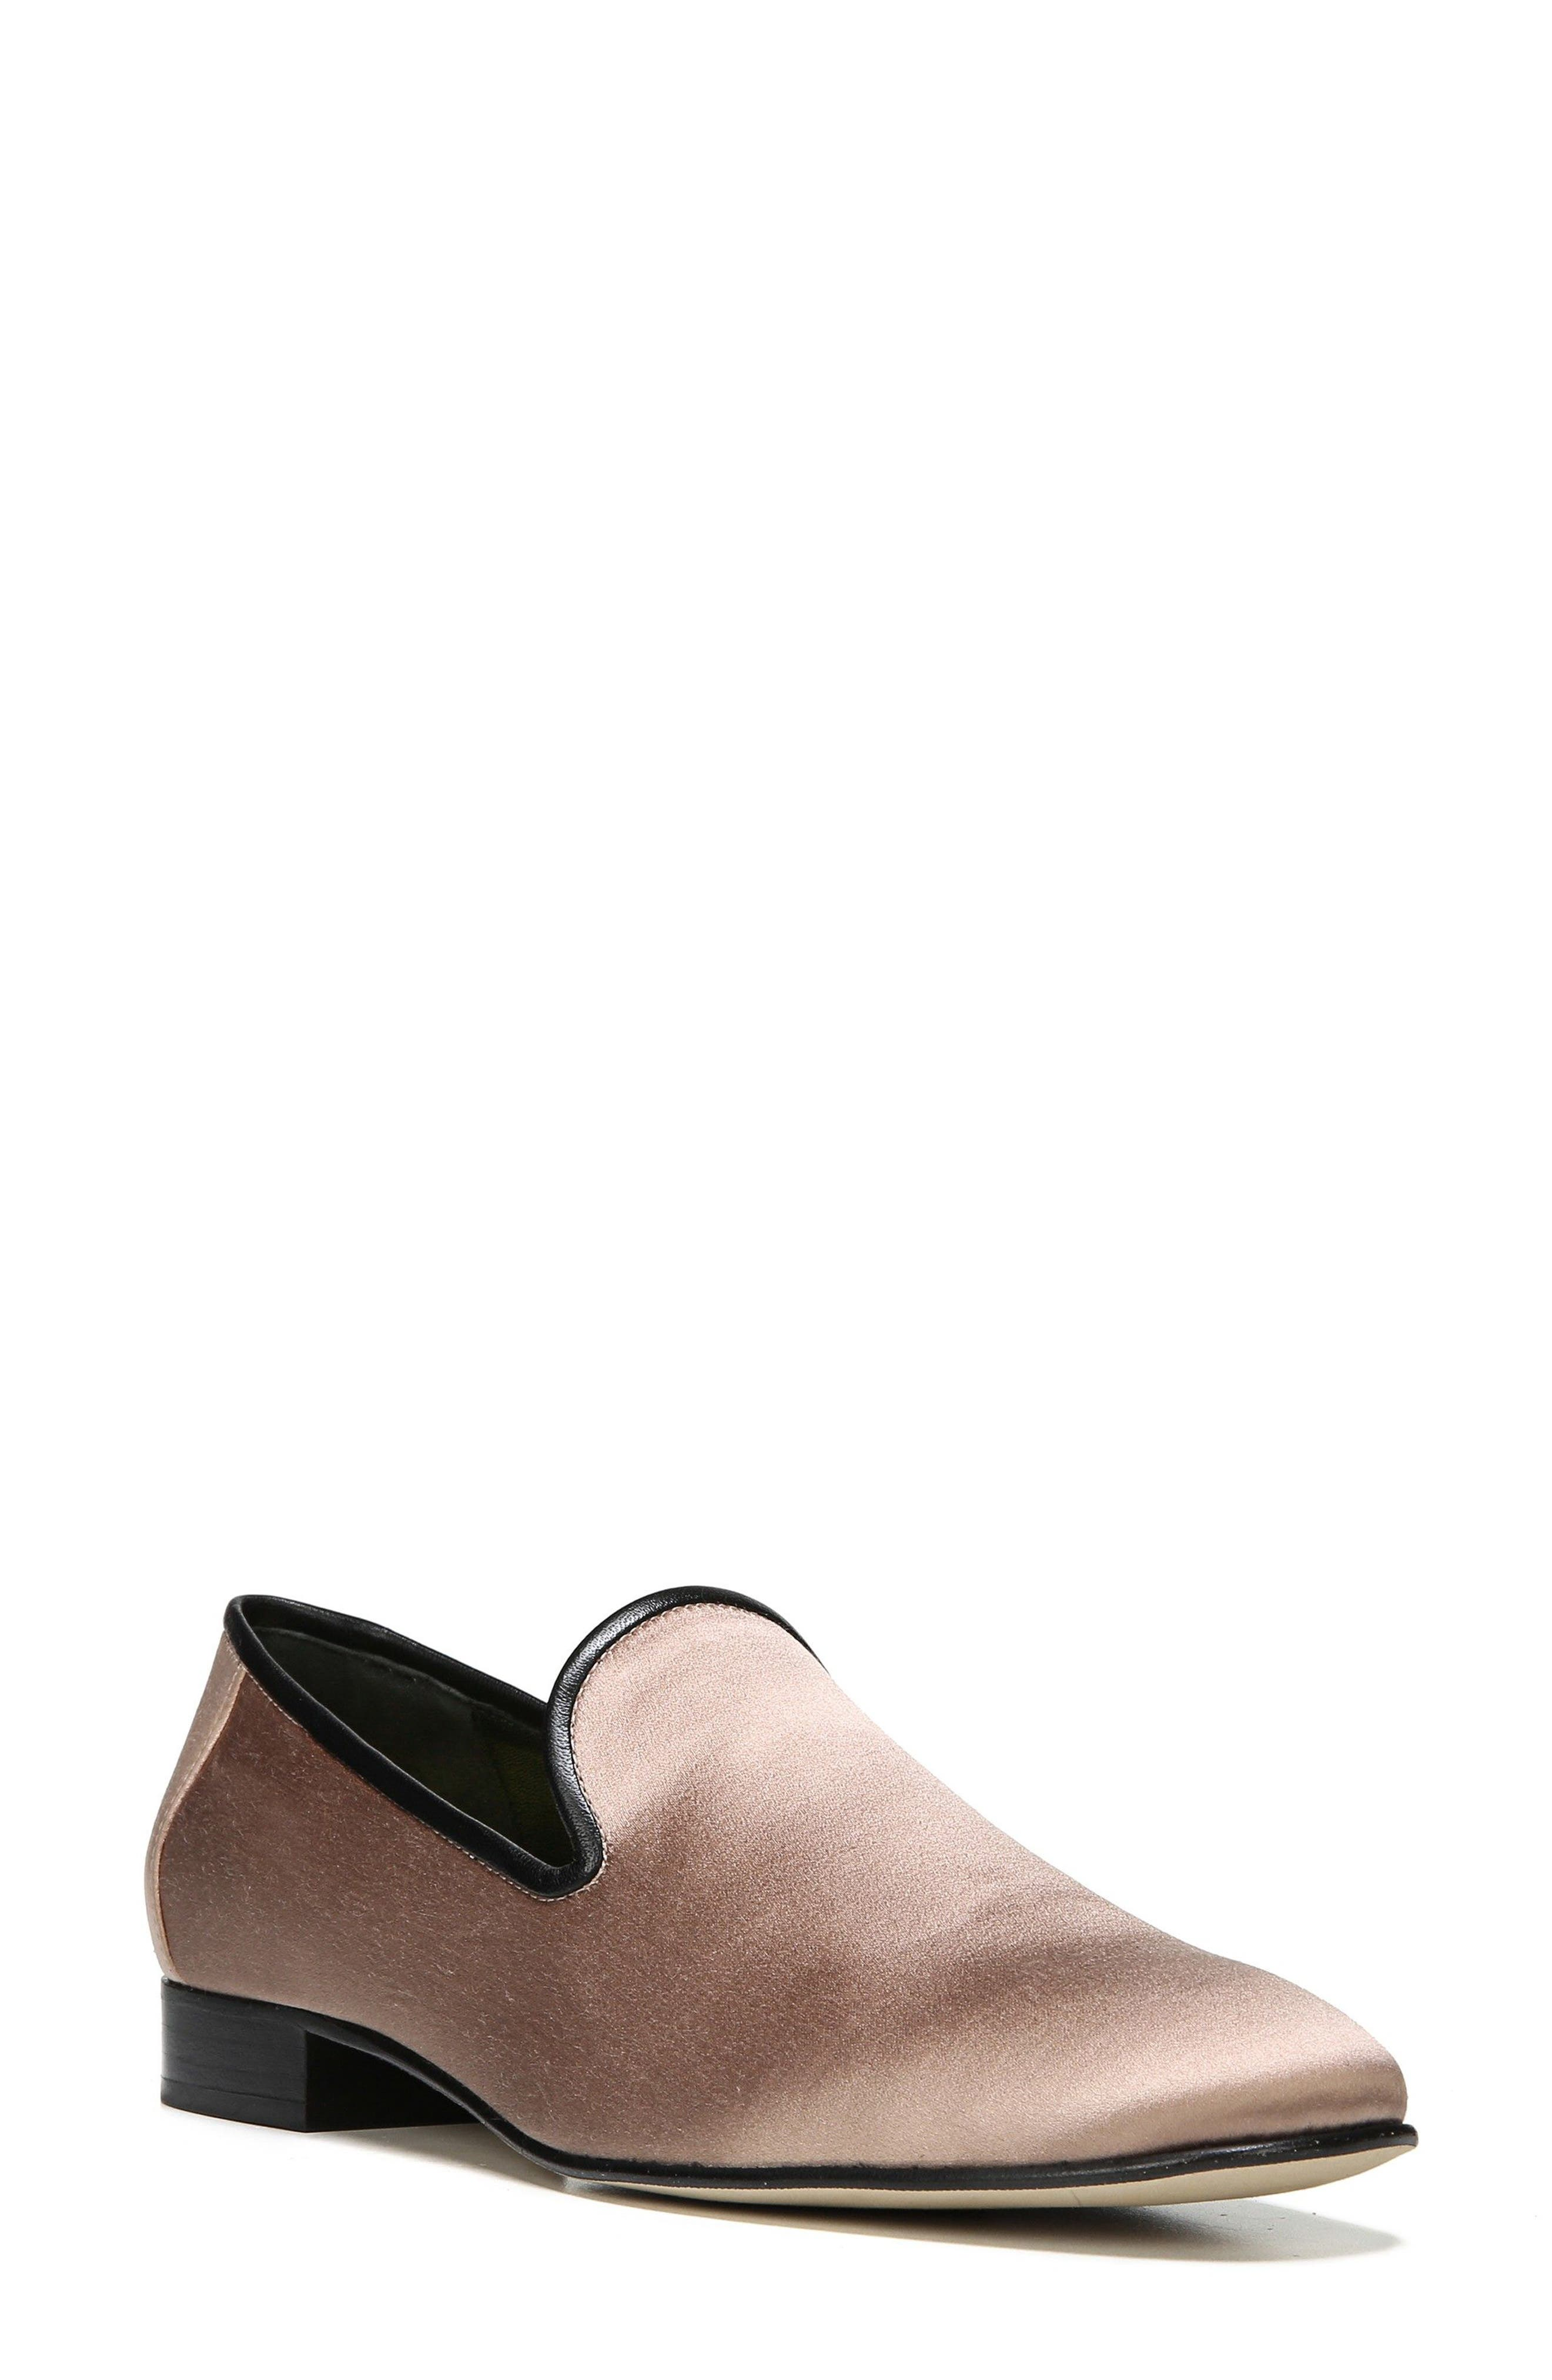 Alternate Image 1 Selected - Diane Von Furstenberg Leiden Loafer (Women)